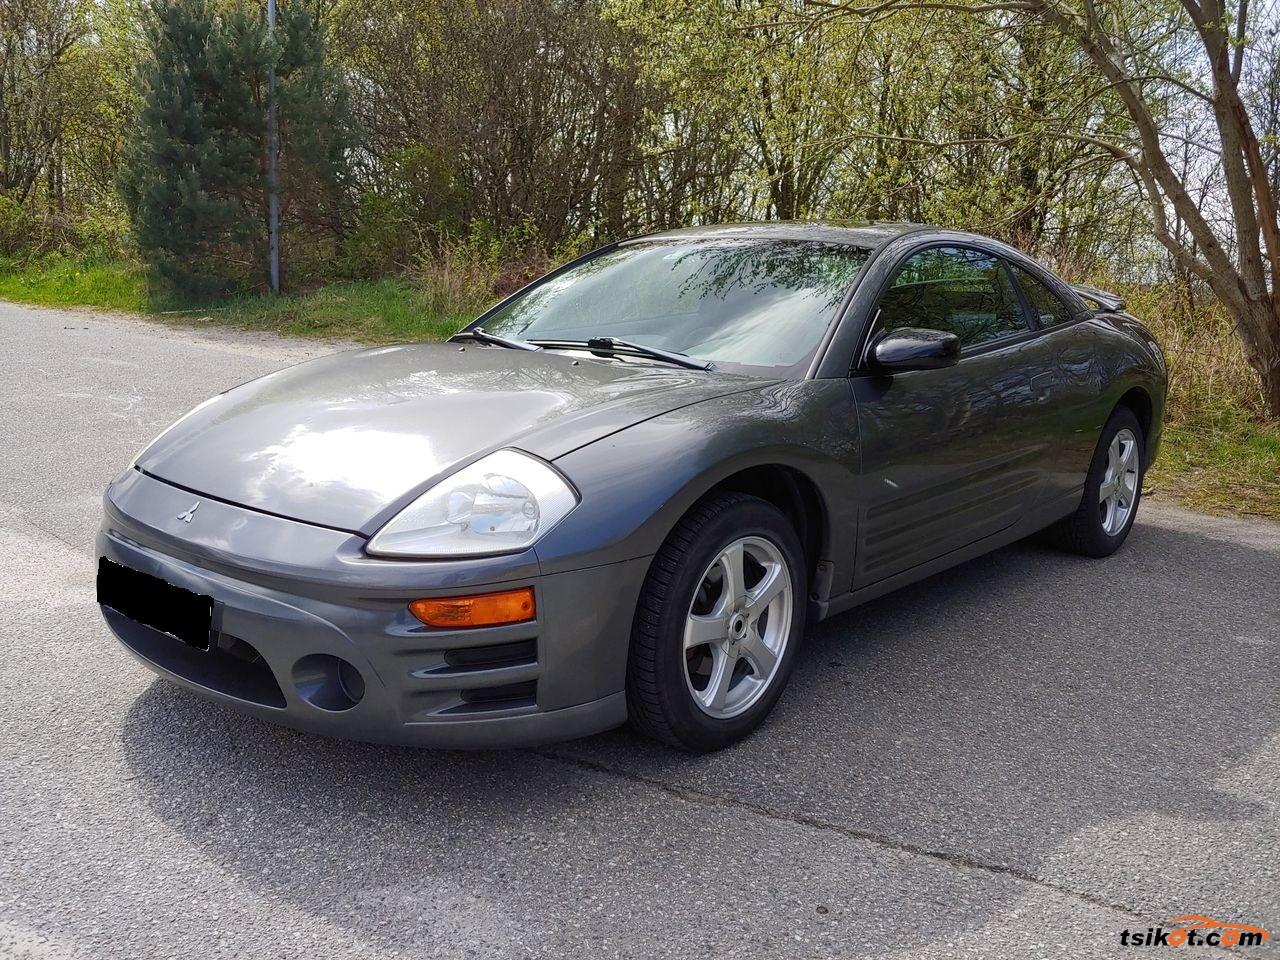 Mitsubishi Eclipse 2003 - 1